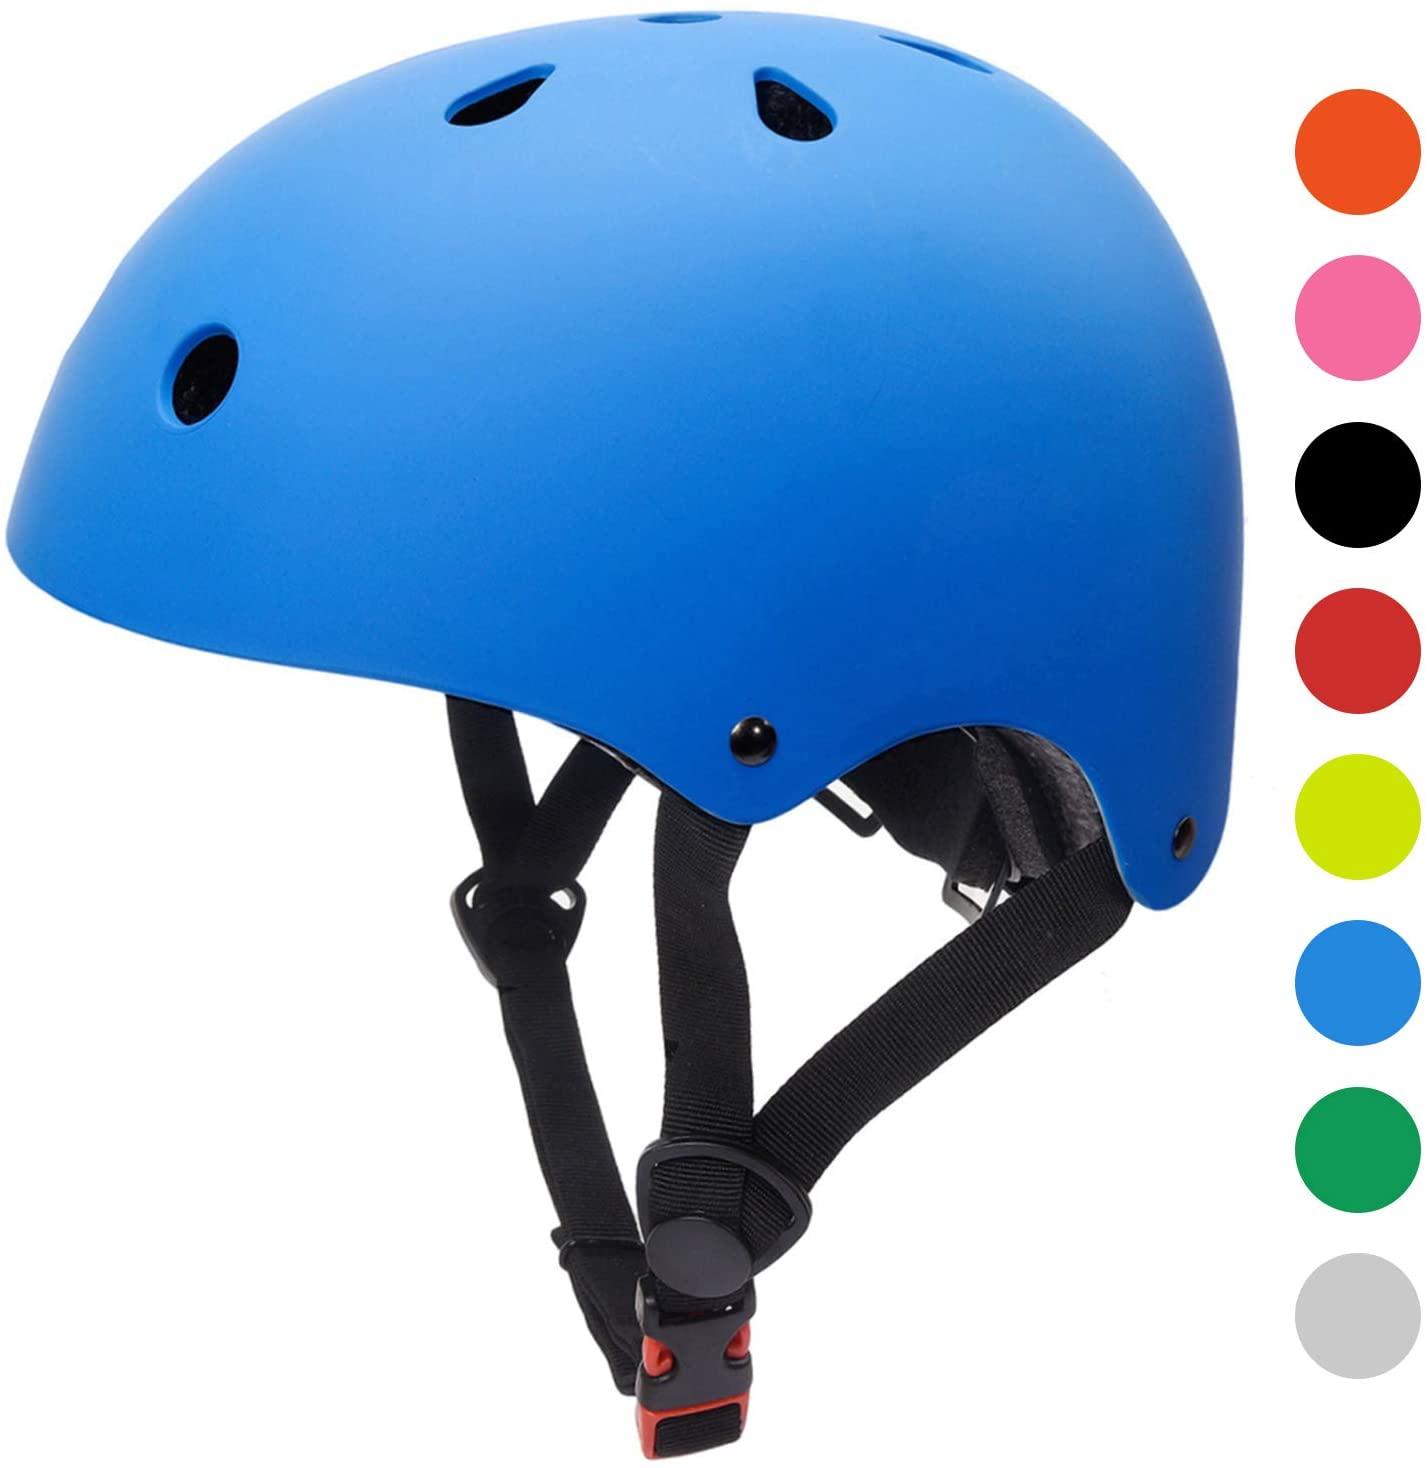 Glaf Adult Cycling Bike Helmet Men Women Skateboard Helmet CPSC Certified Adjustable Lightweight Helmet